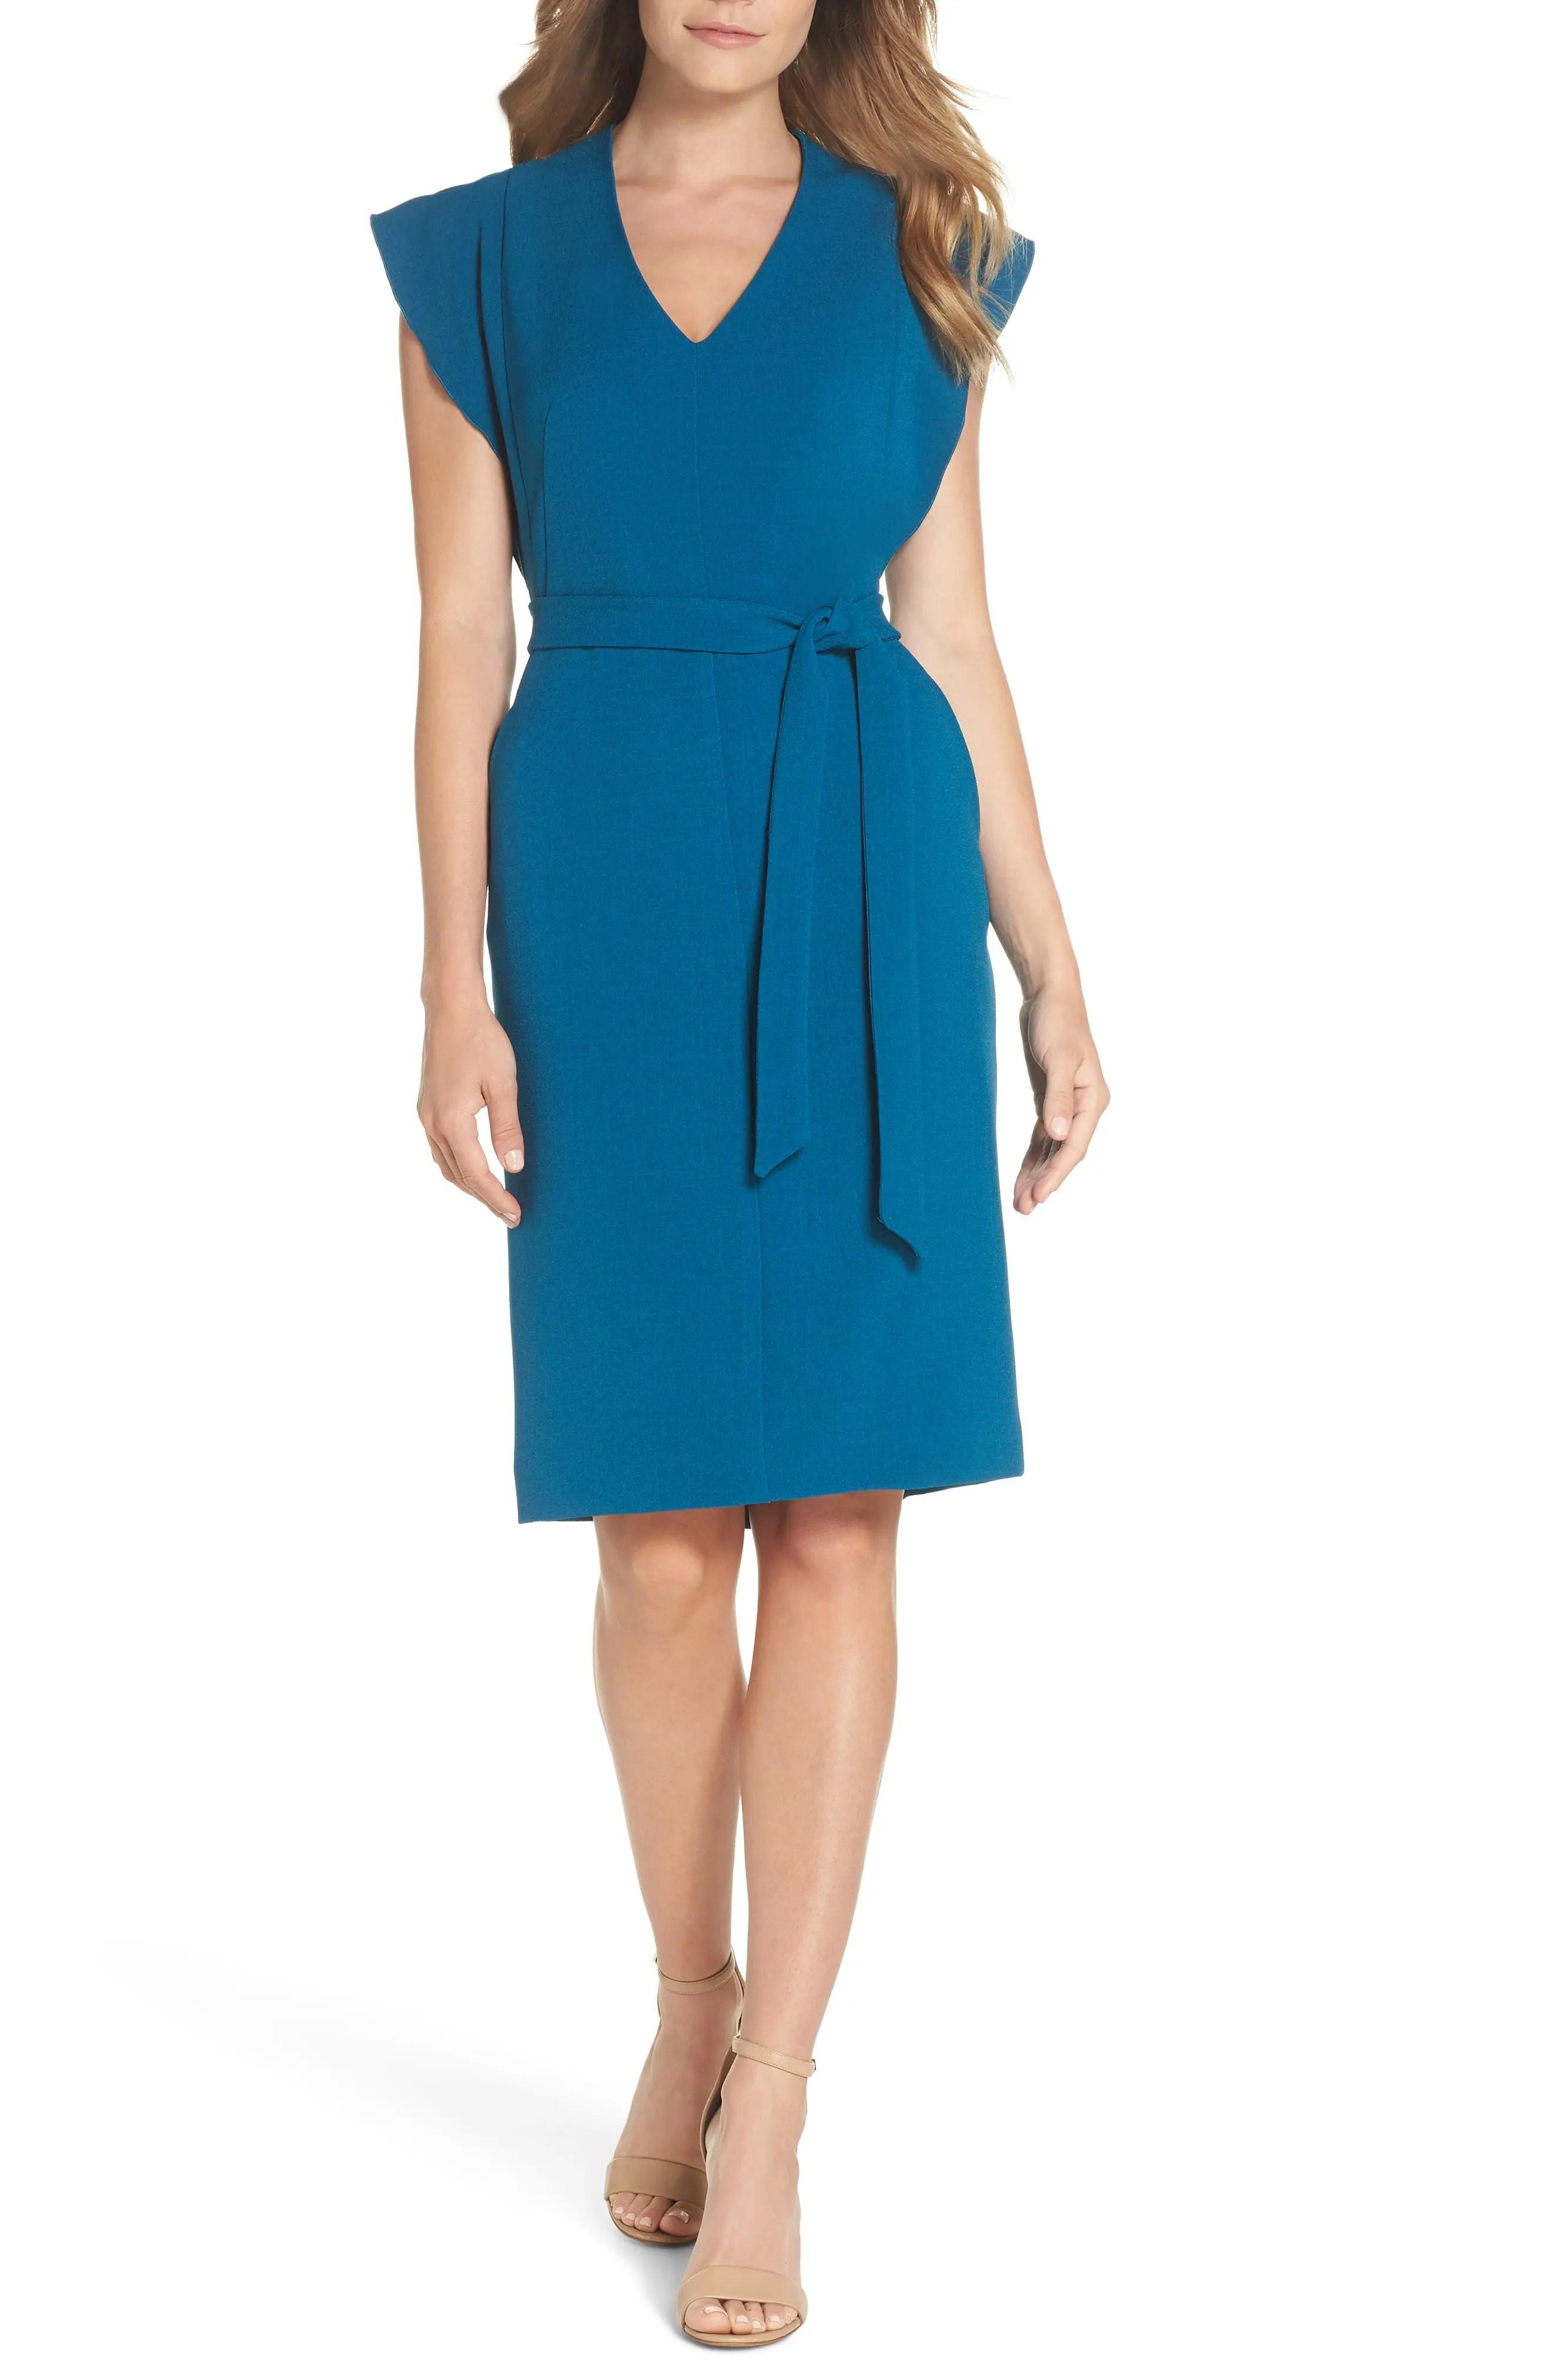 Eliza  ruffle sleeve sheath dress also women   dresses nordstrom rh shoprdstrom